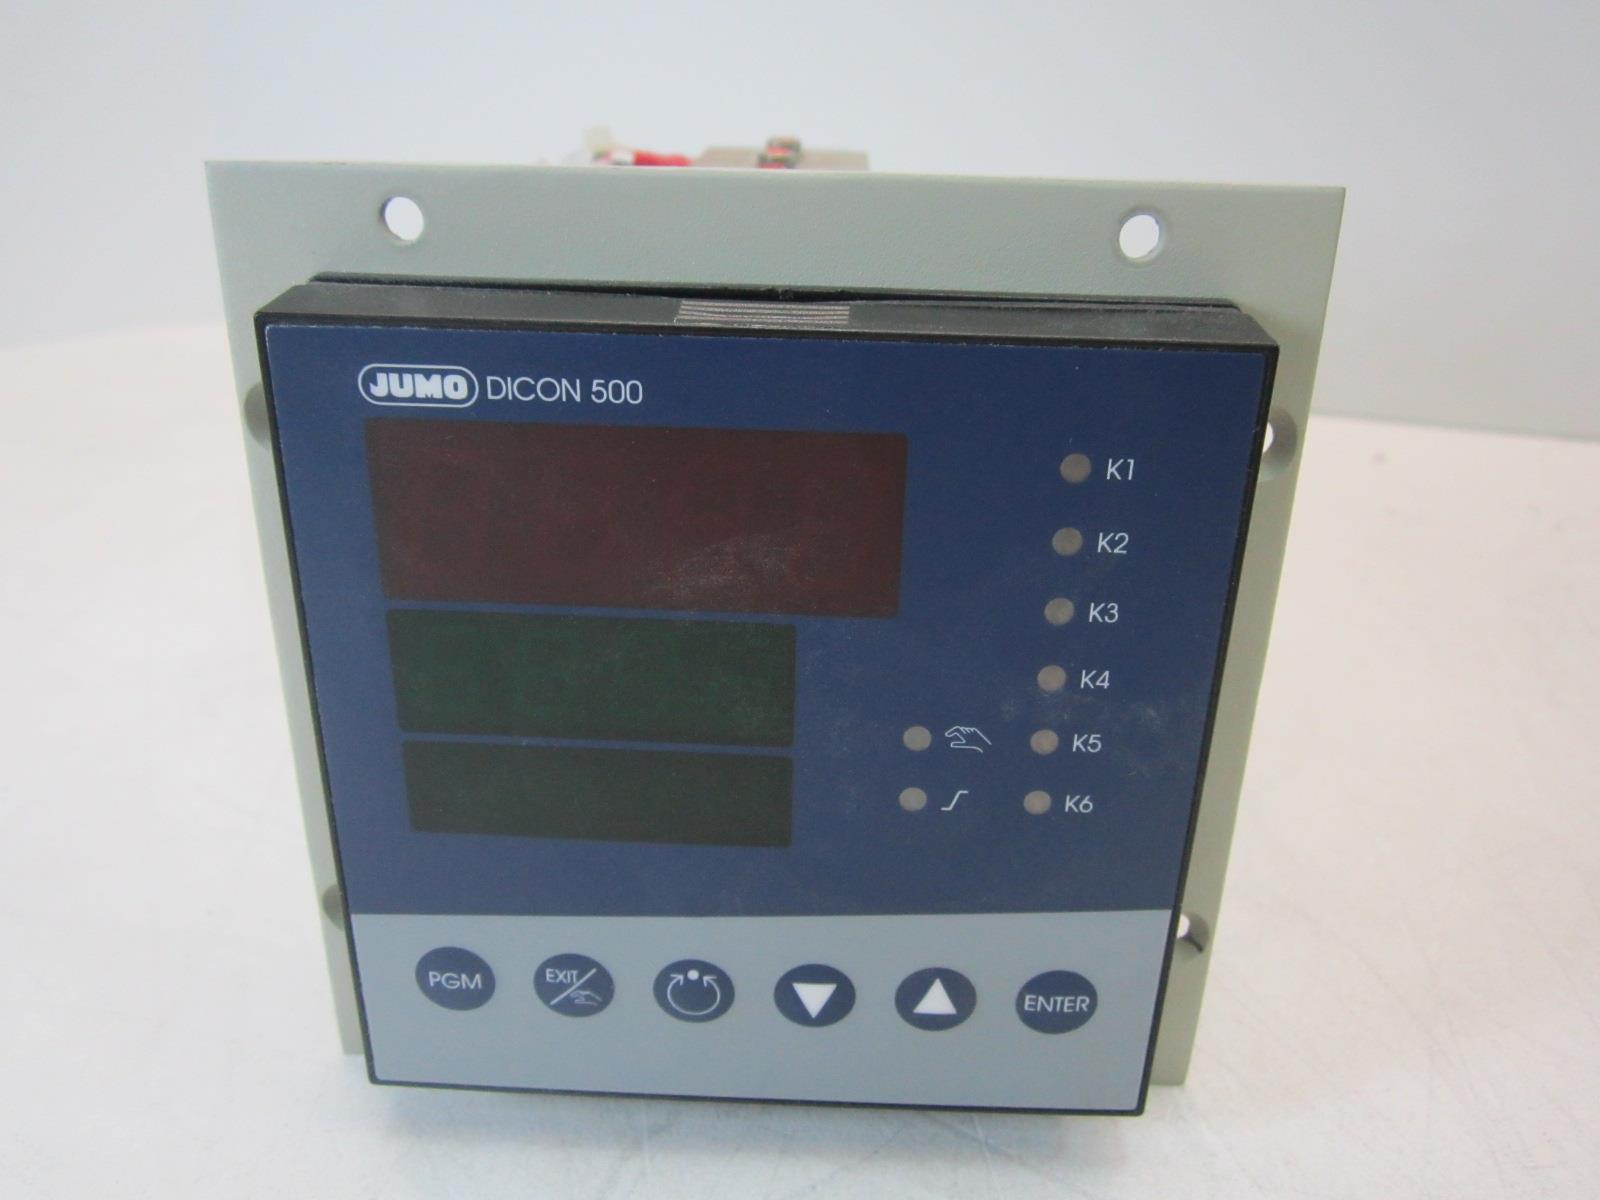 JUMO DICON 500 Controller Universeller Prozessregler